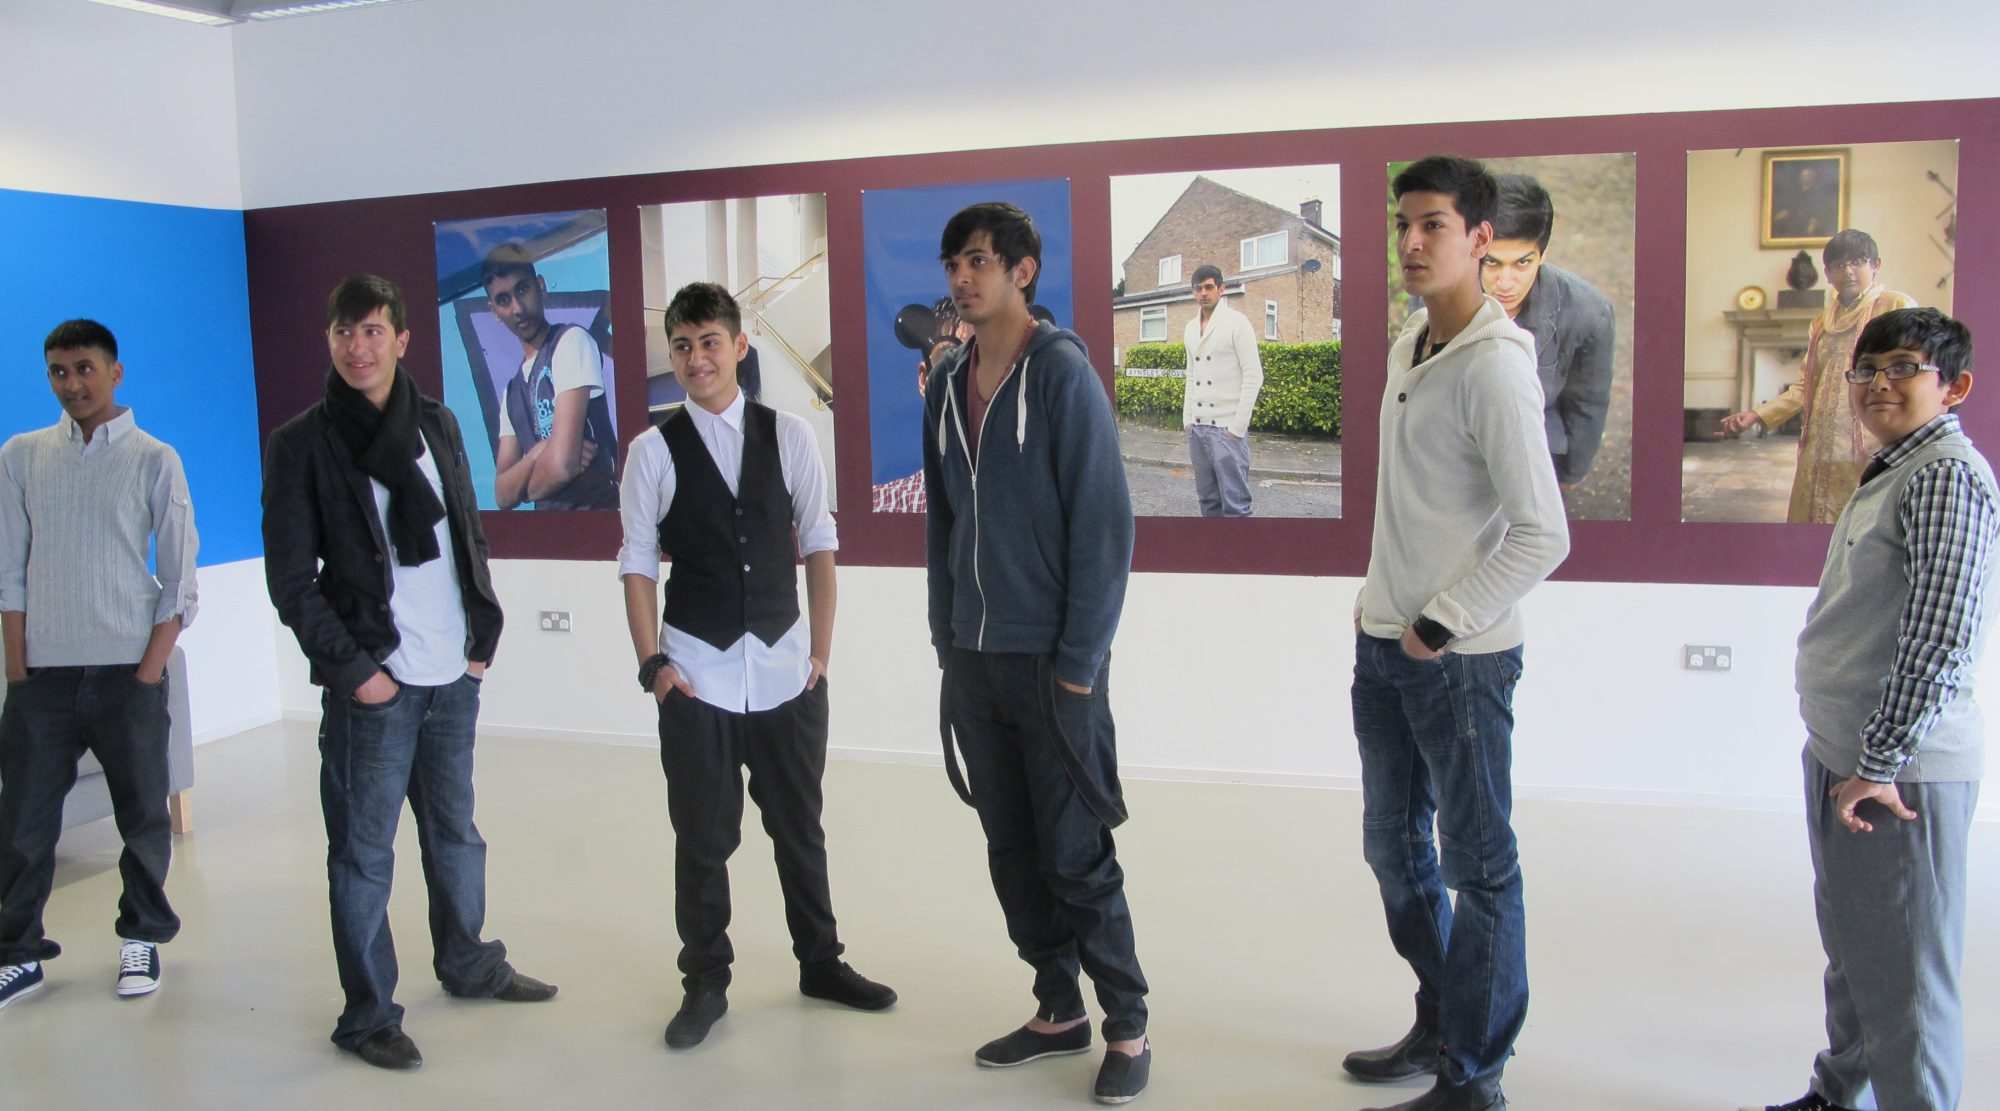 Gentlemen of Bradford — Impressions Gallery